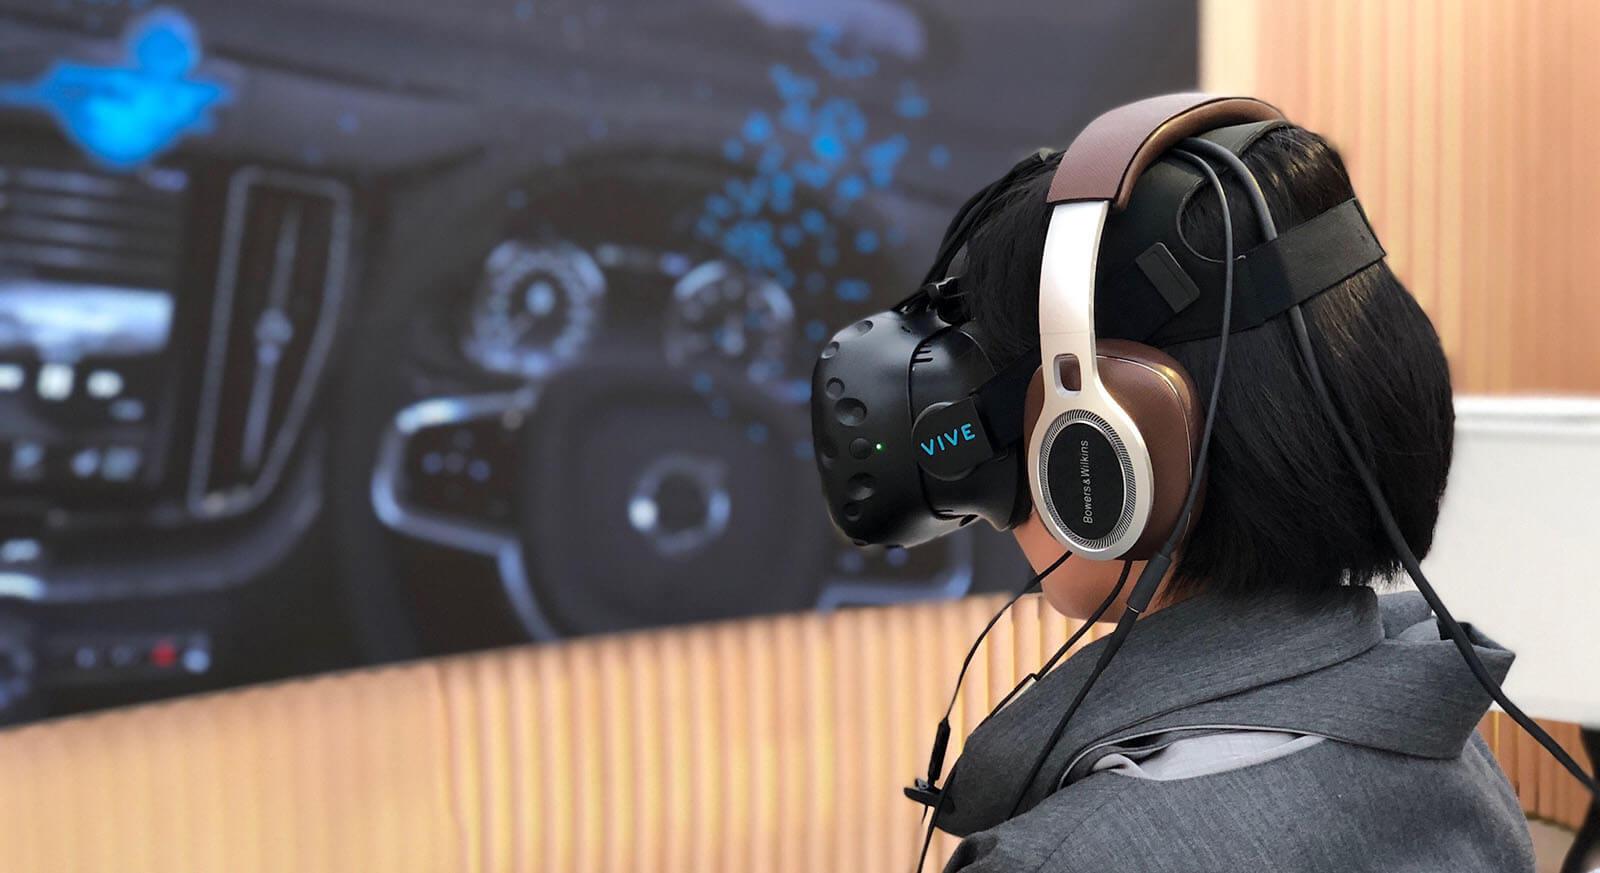 Volvo XC90 Behind the Scenes - Volvo Virtual Reality - YouTube |Volvo Virtual Reality